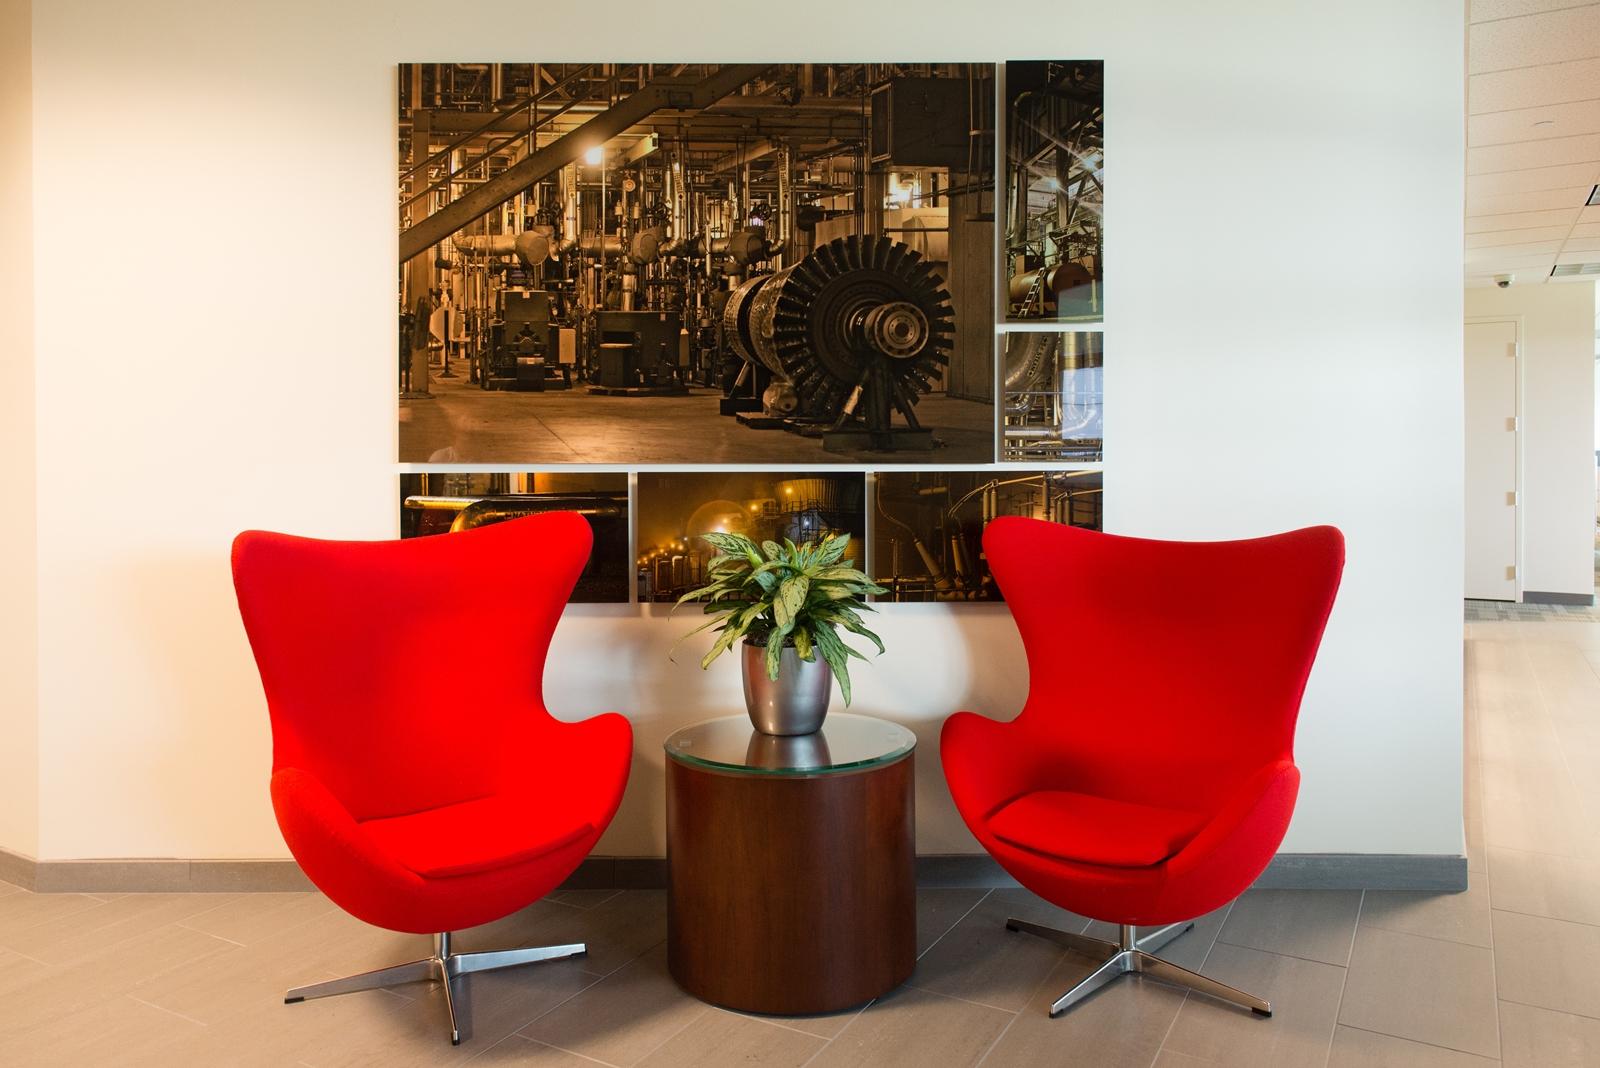 Interiors-003.jpg